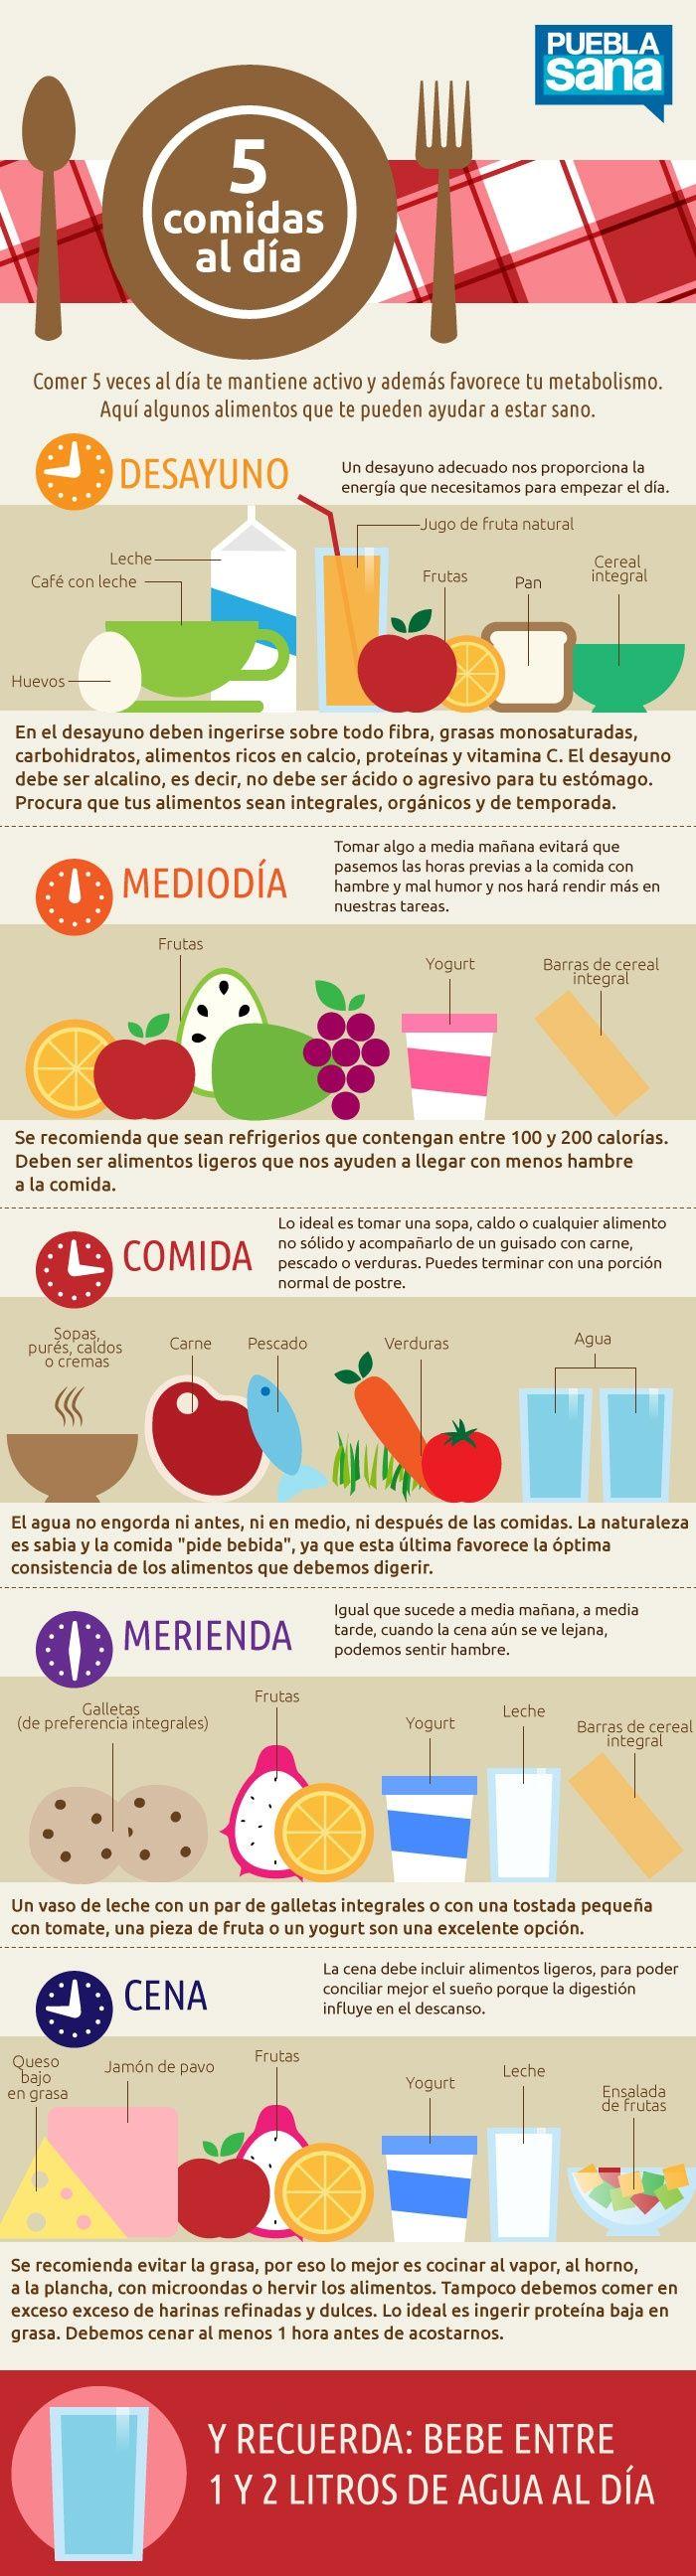 Infografía cinco comidas al día